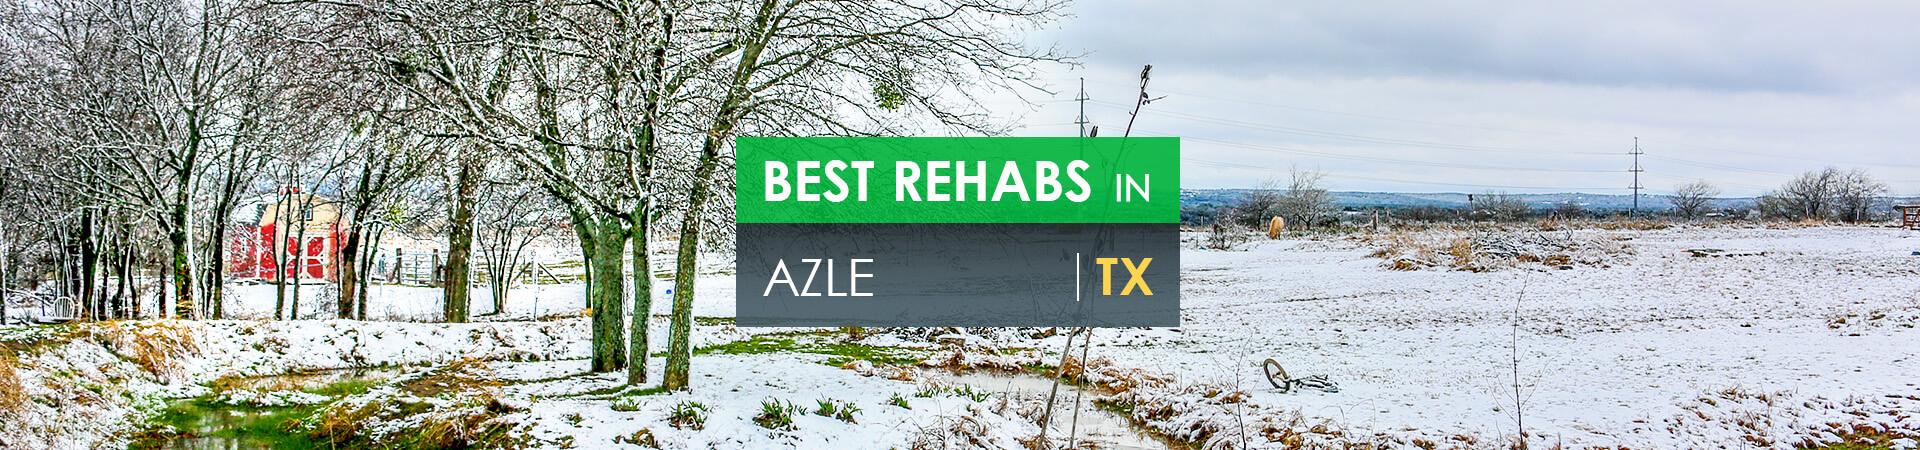 Best rehabs in Azle, TX